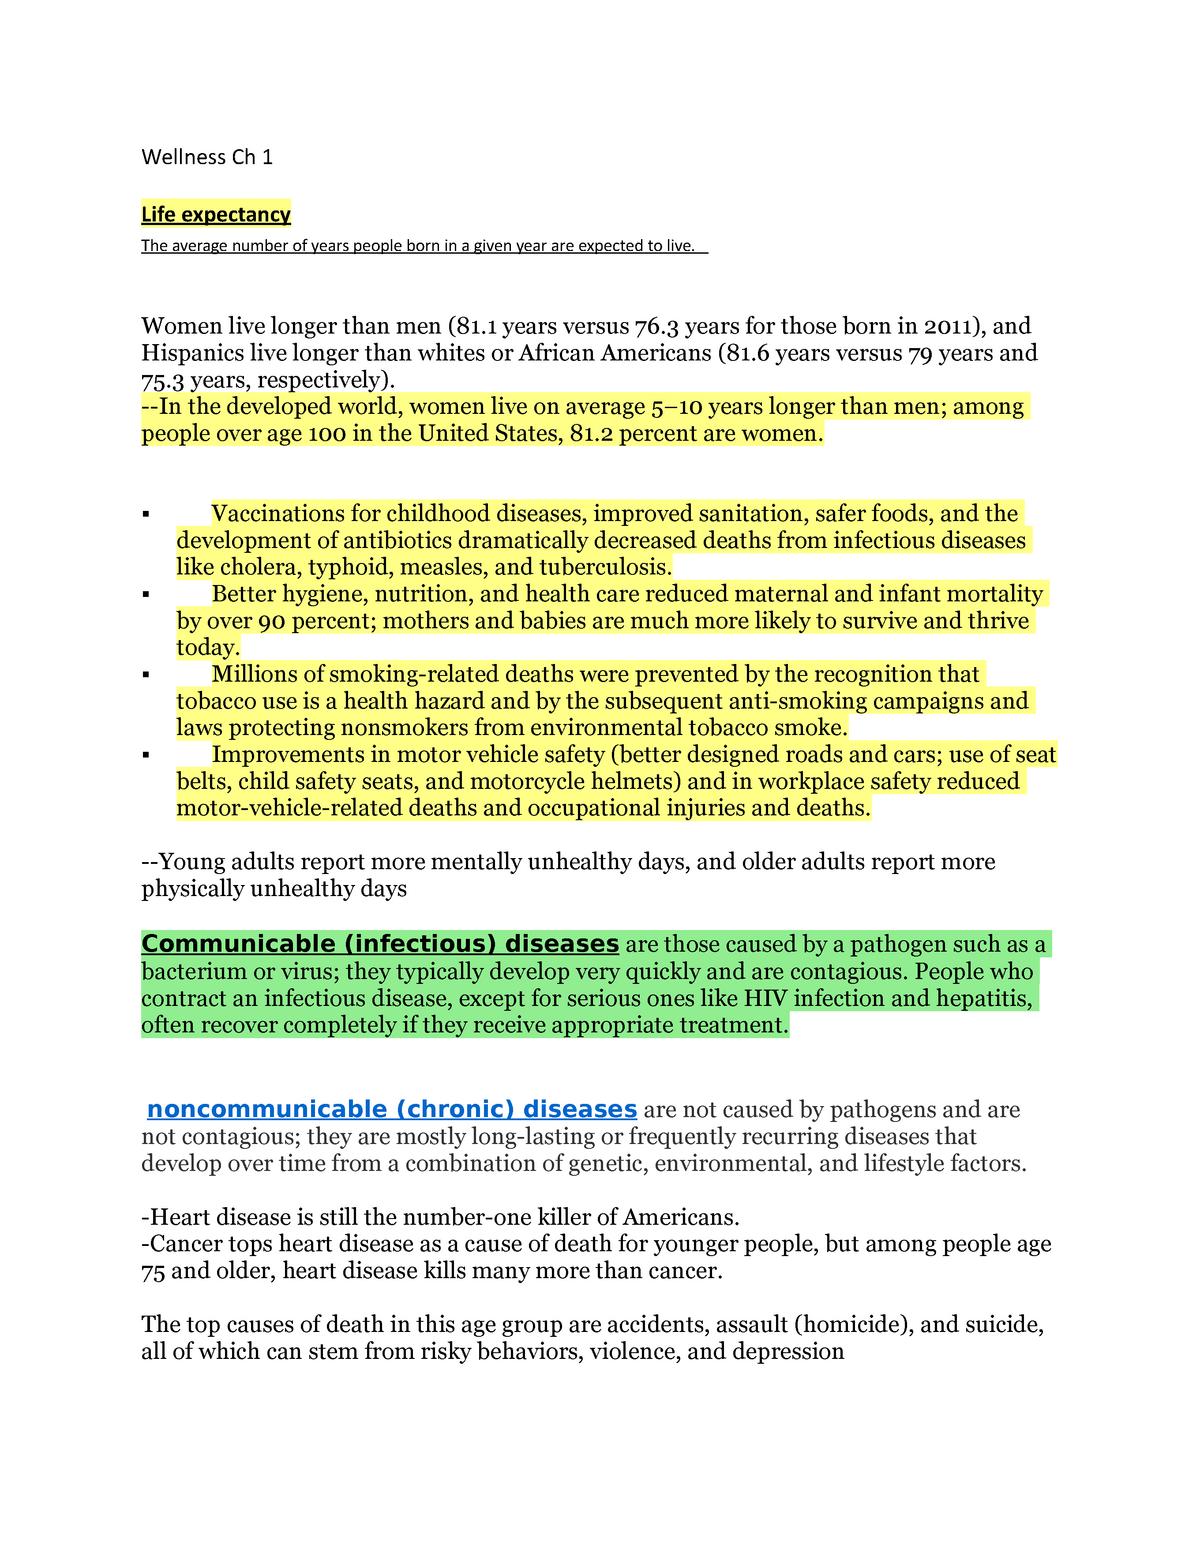 Wellness Ch 1 Notes - Grade: A - HPE 100: Wellness - StuDocu